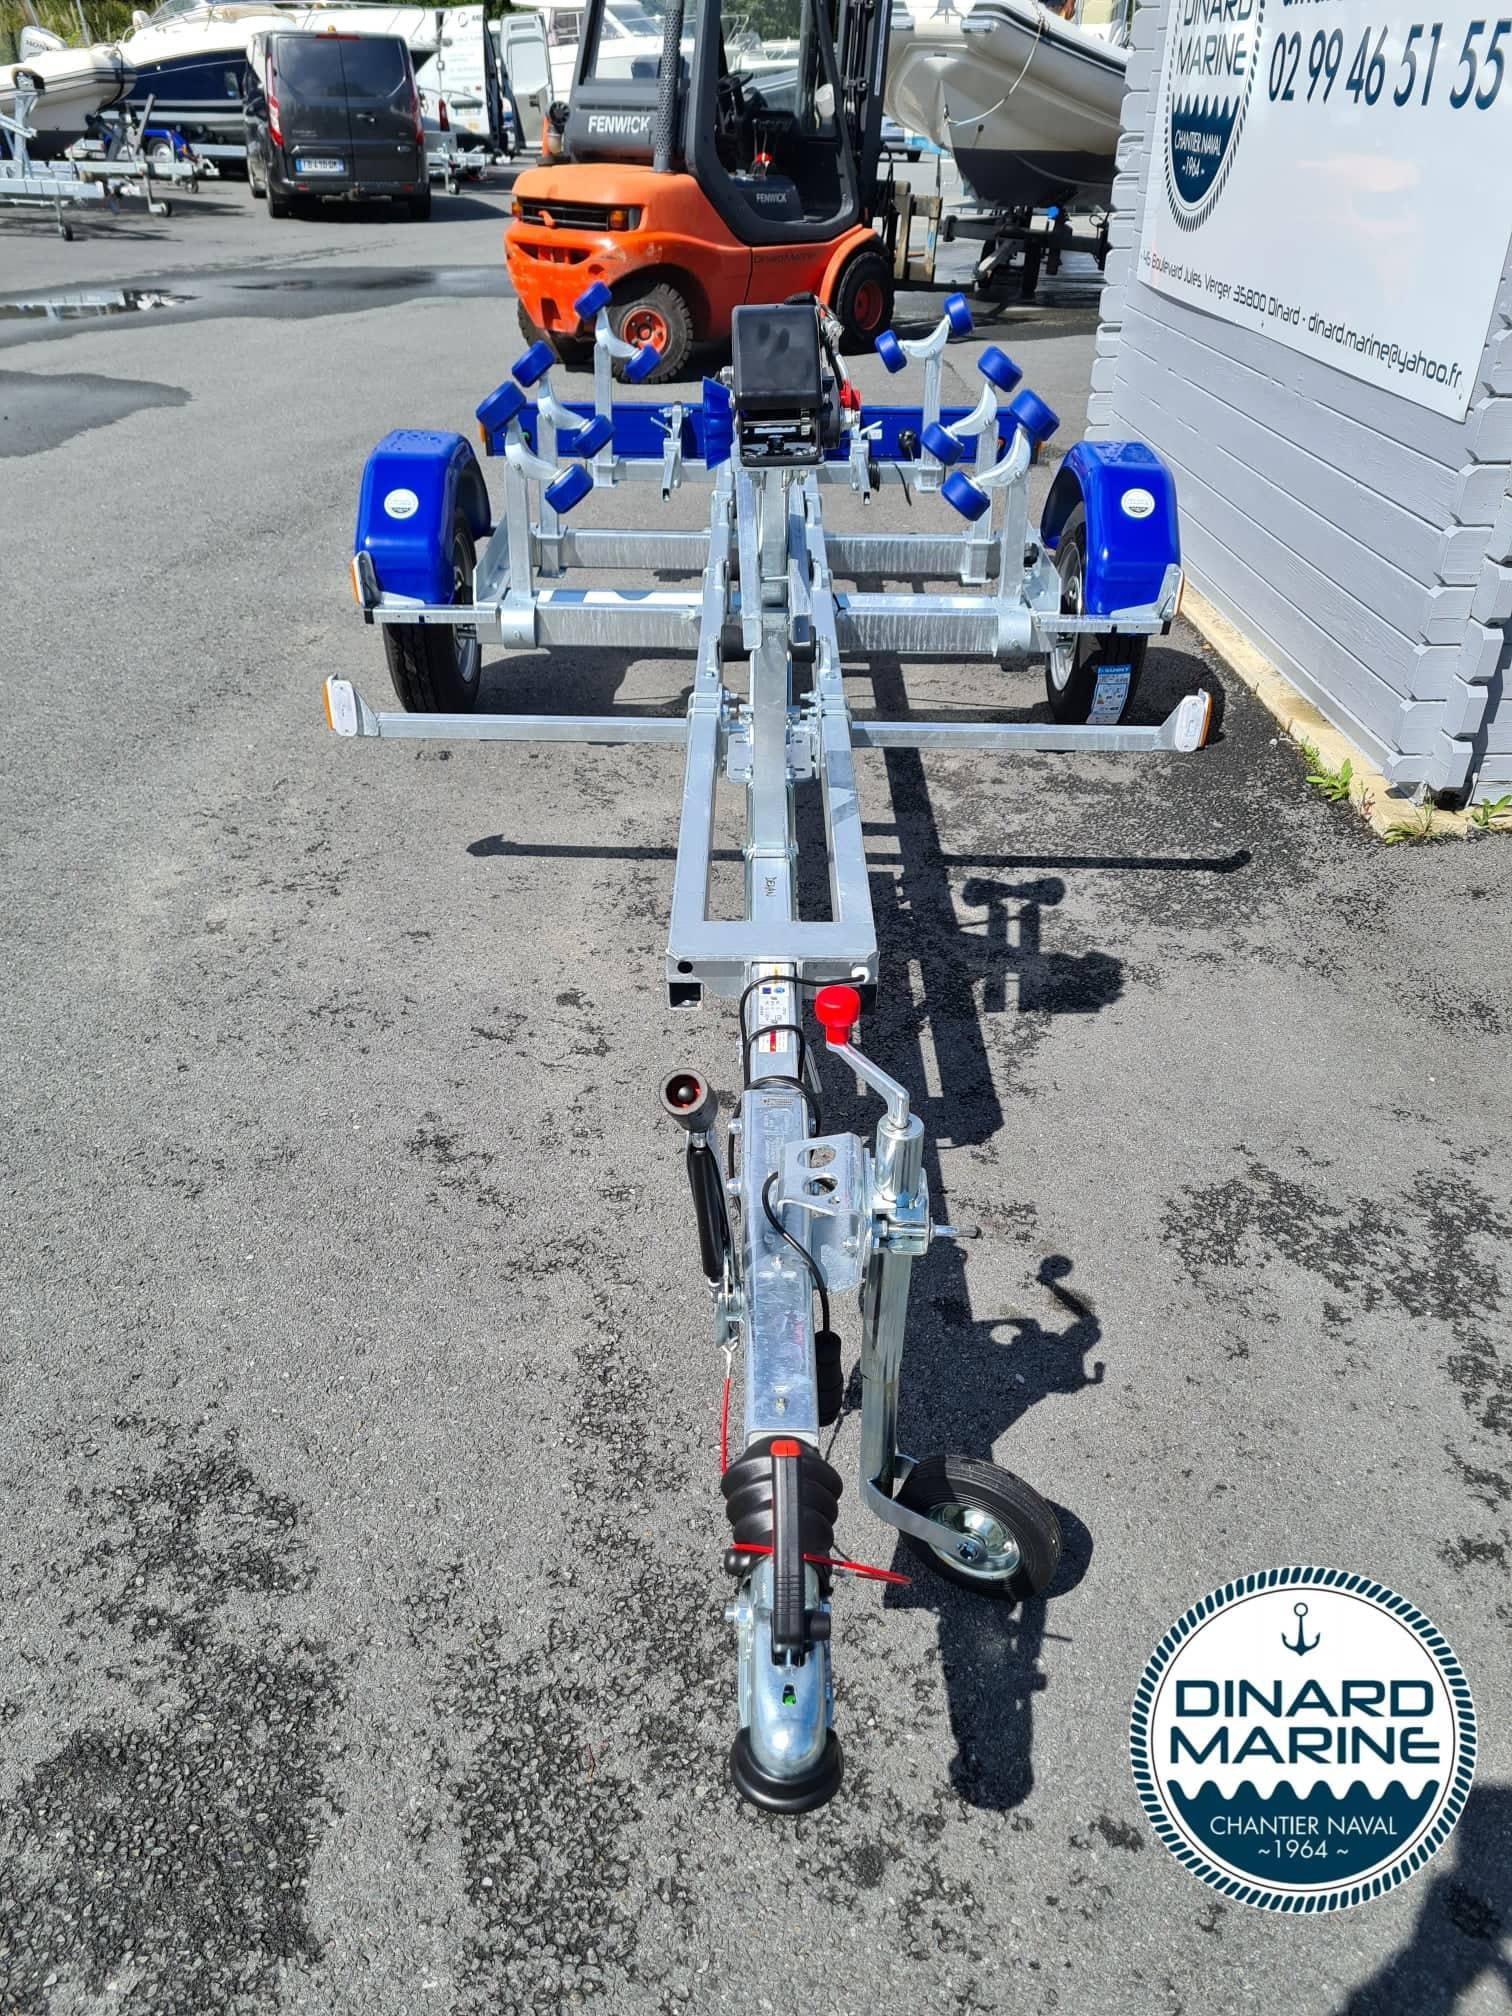 tete d'attellage Remorque Sun Way SW845 PTAC 1200 Kg disponible en stock chez DINARD MARINE